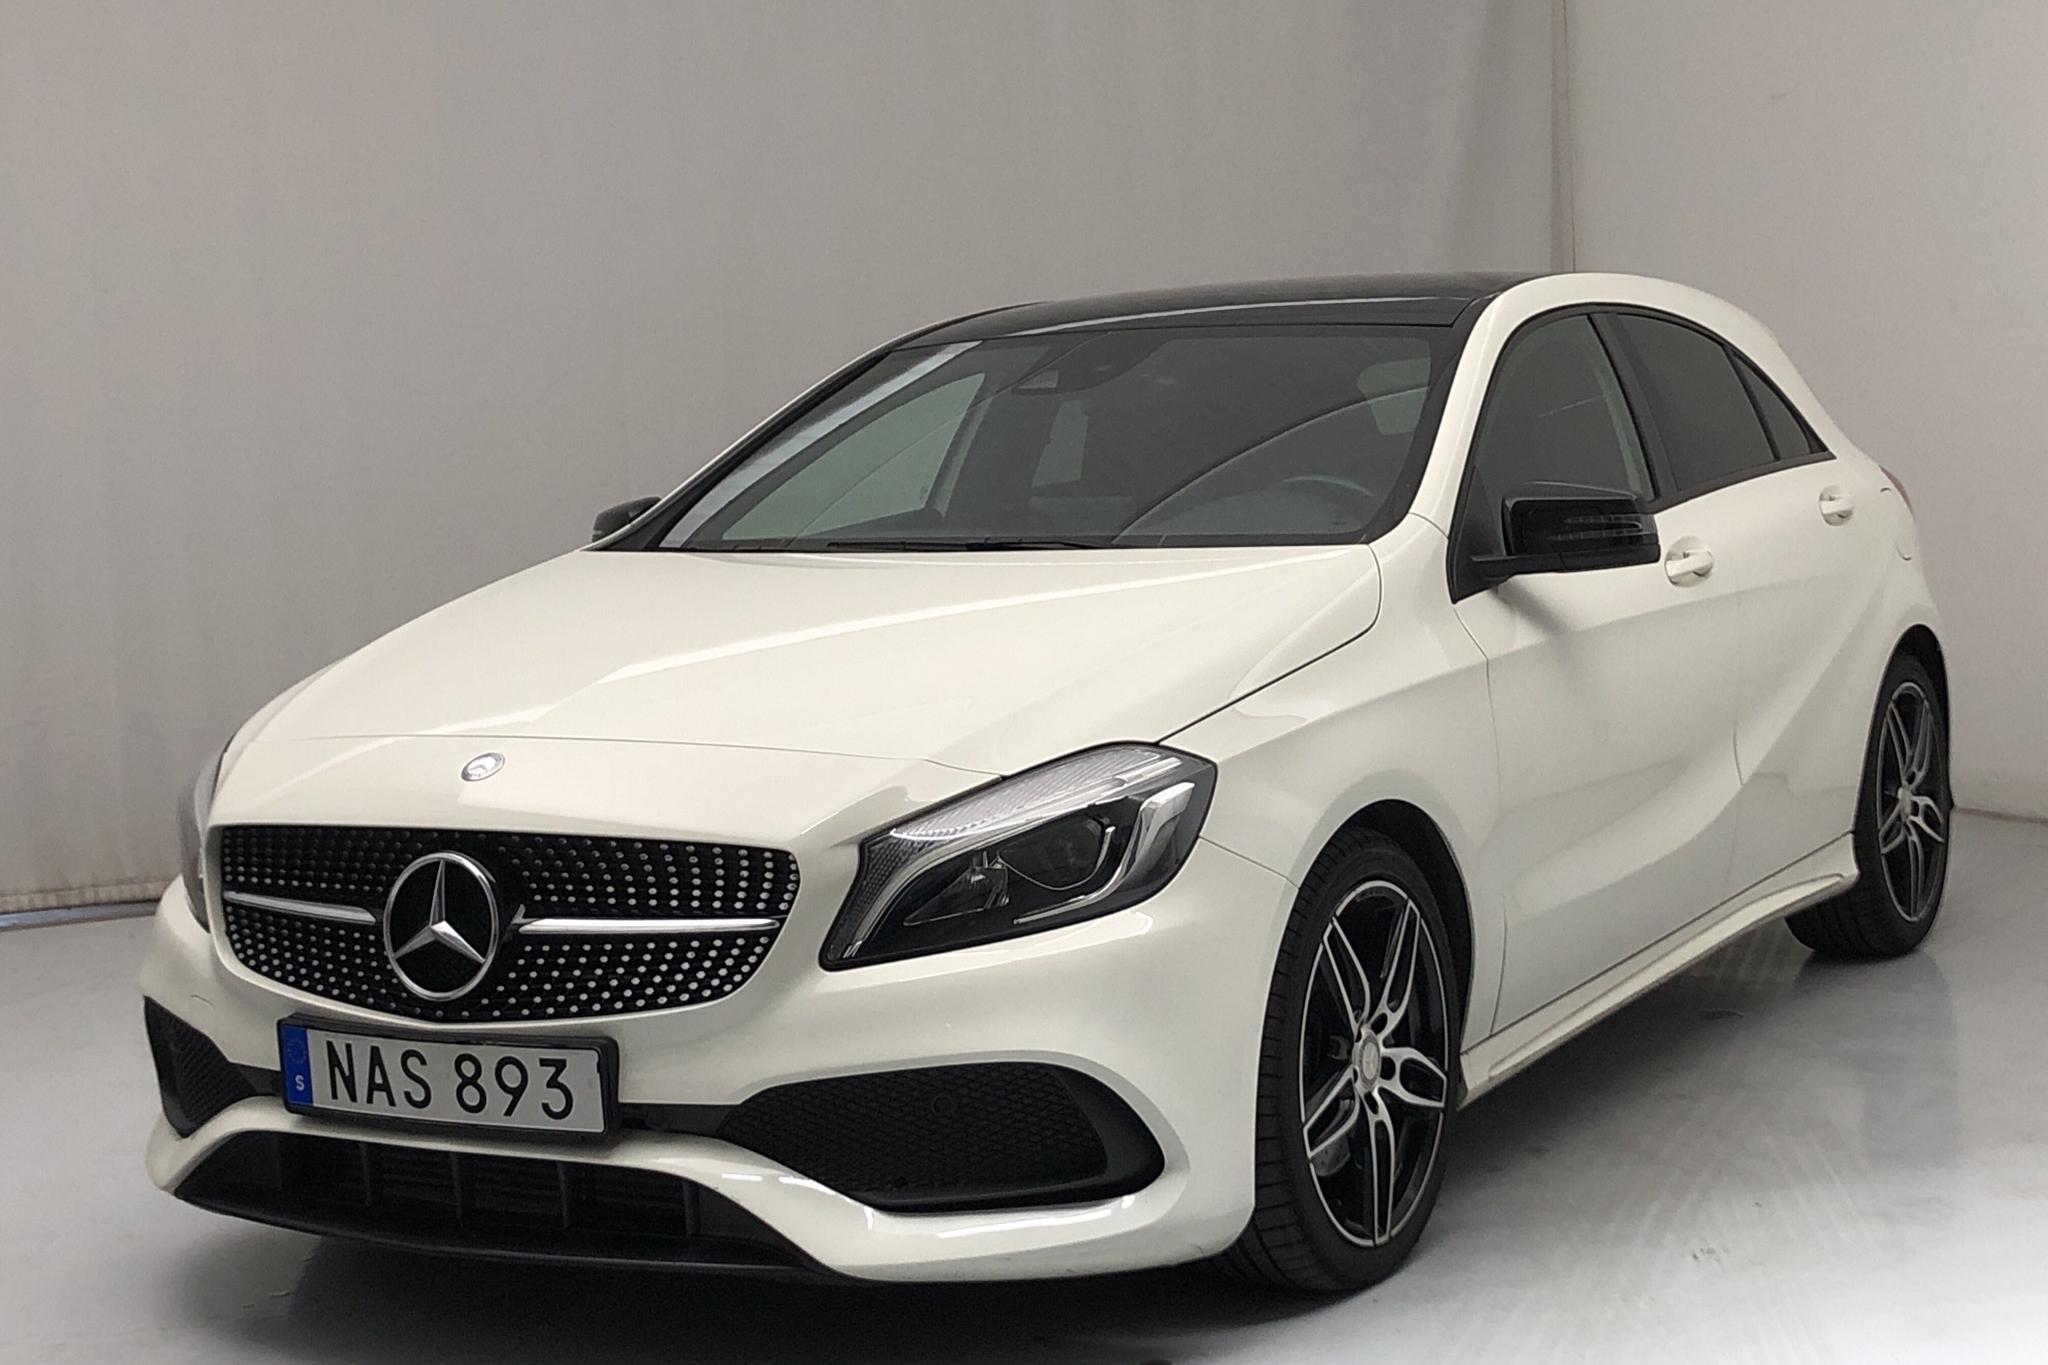 Mercedes A 220 d 4MATIC 5dr W176 (177hk) - 44 440 km - Automatic - white - 2017